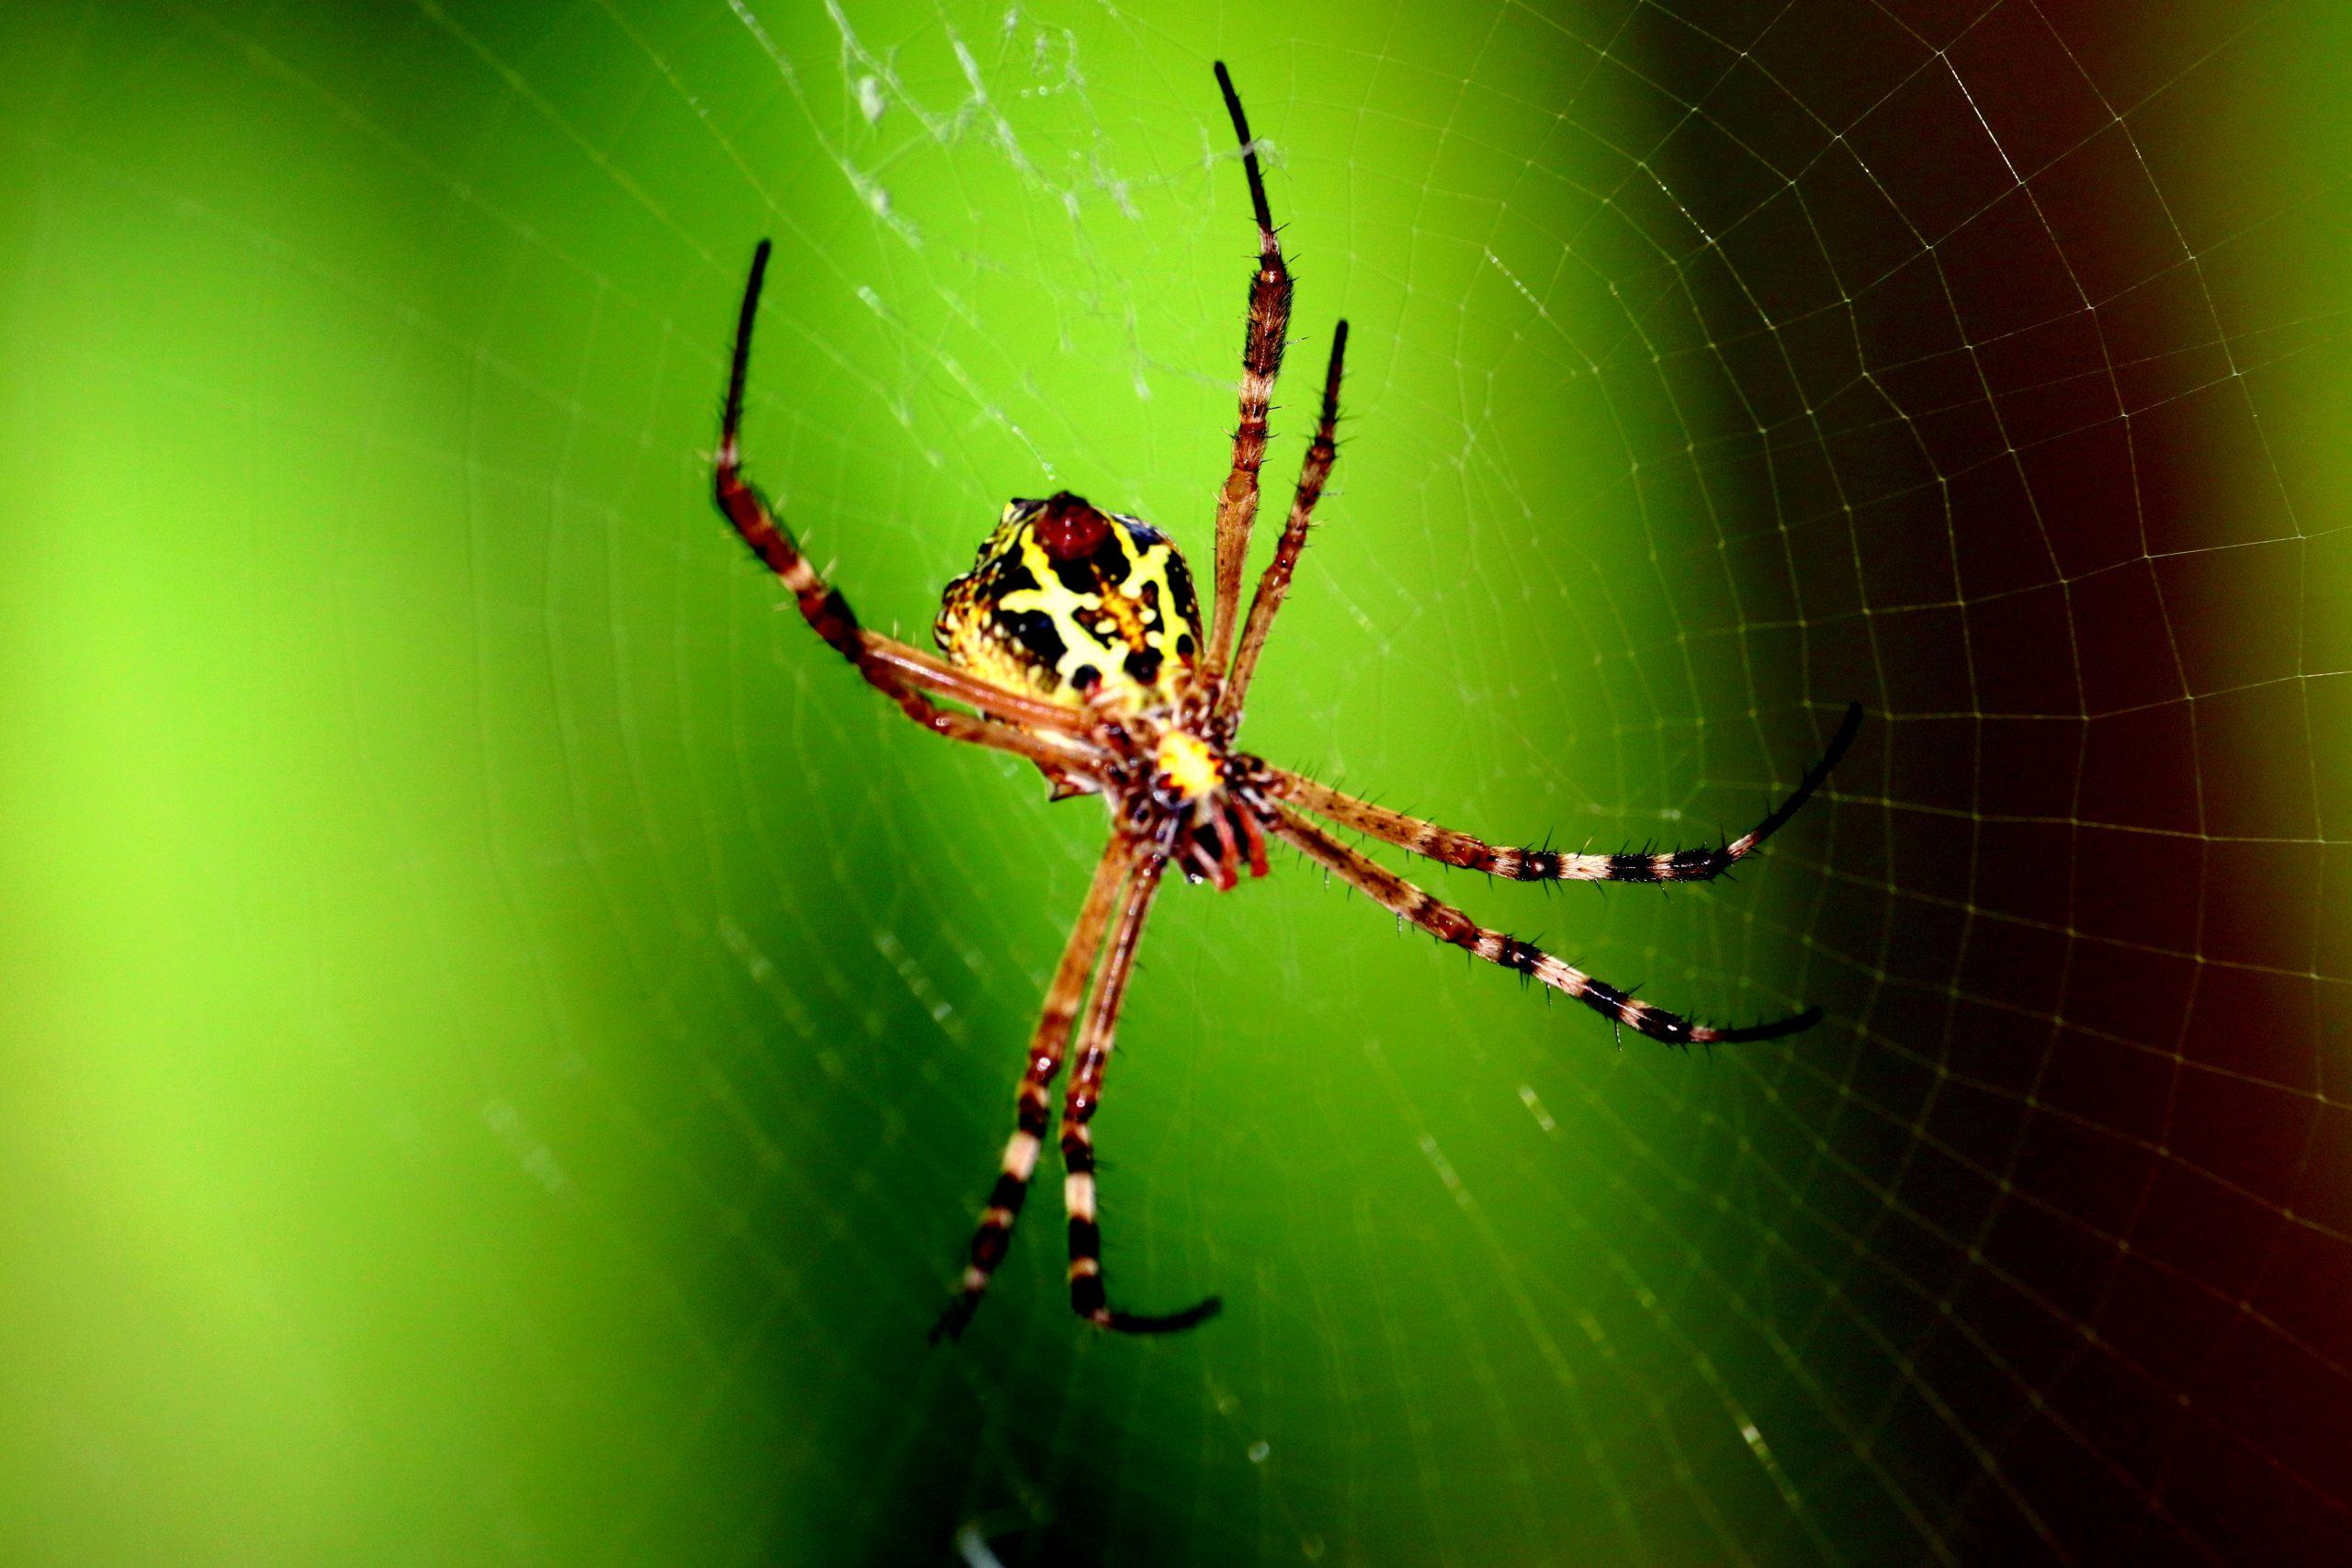 Spider and spiderweb